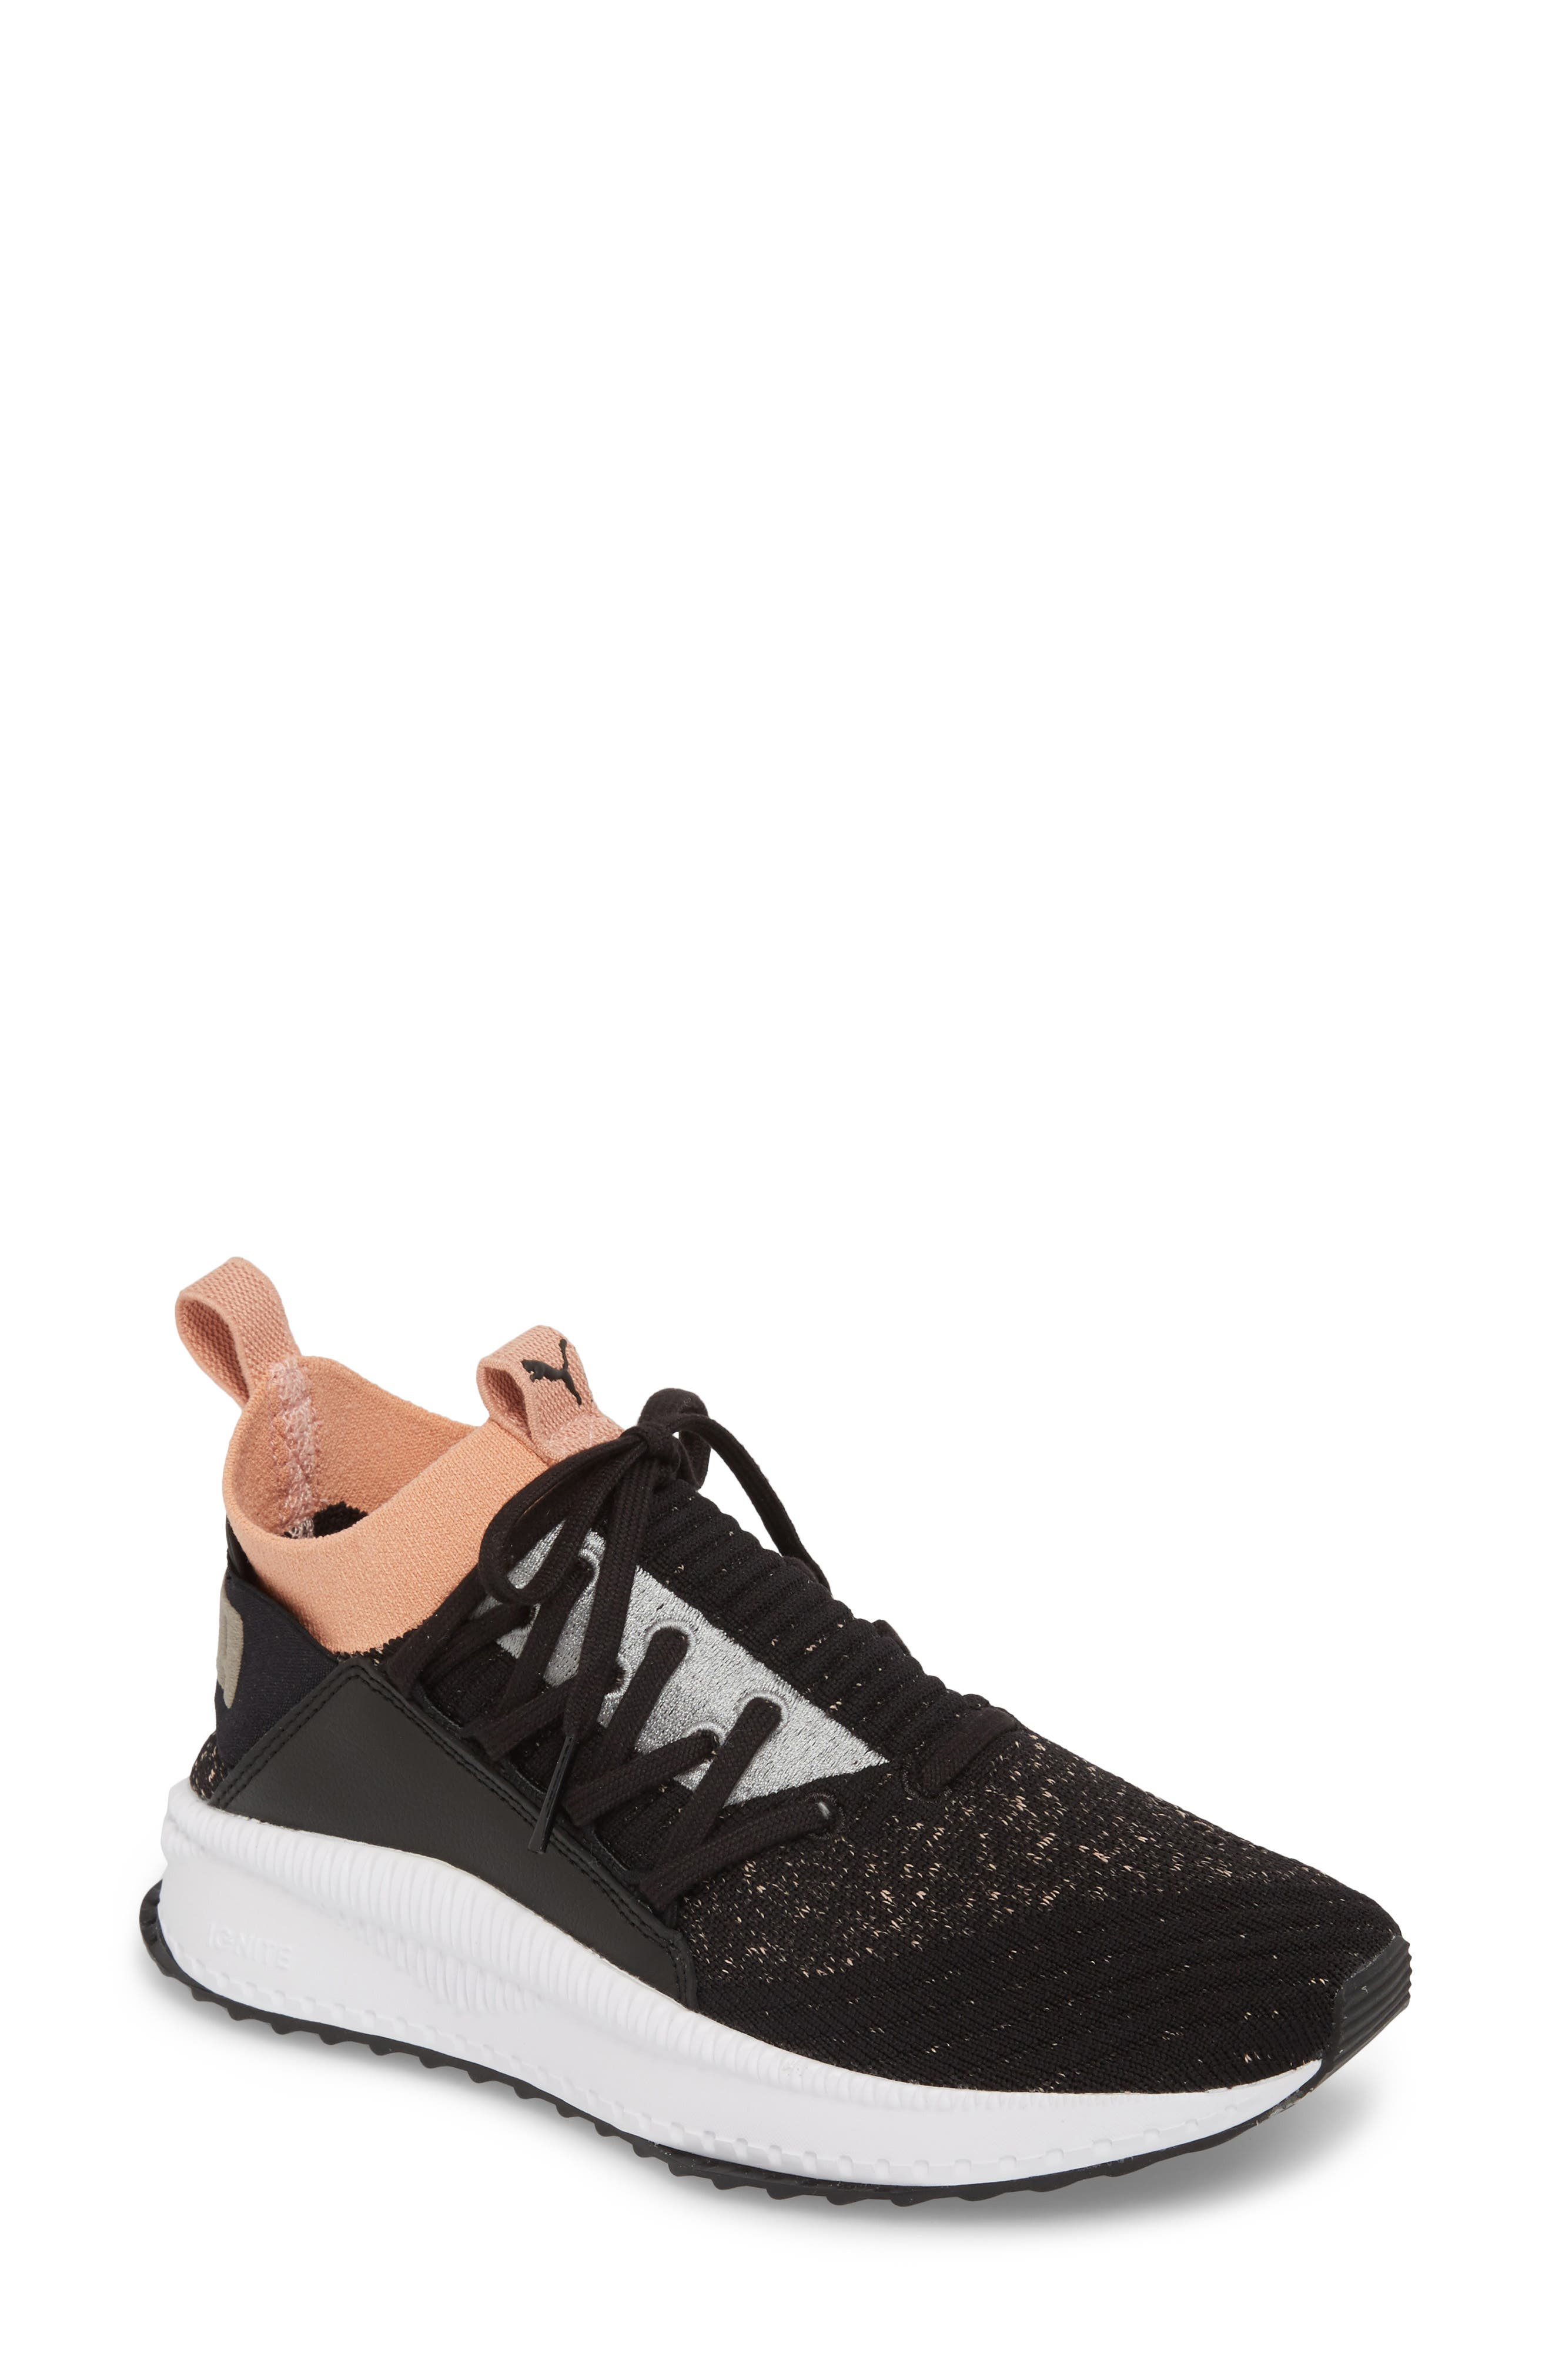 Tsugi Jun Knit Sneaker,                             Main thumbnail 1, color,                             001